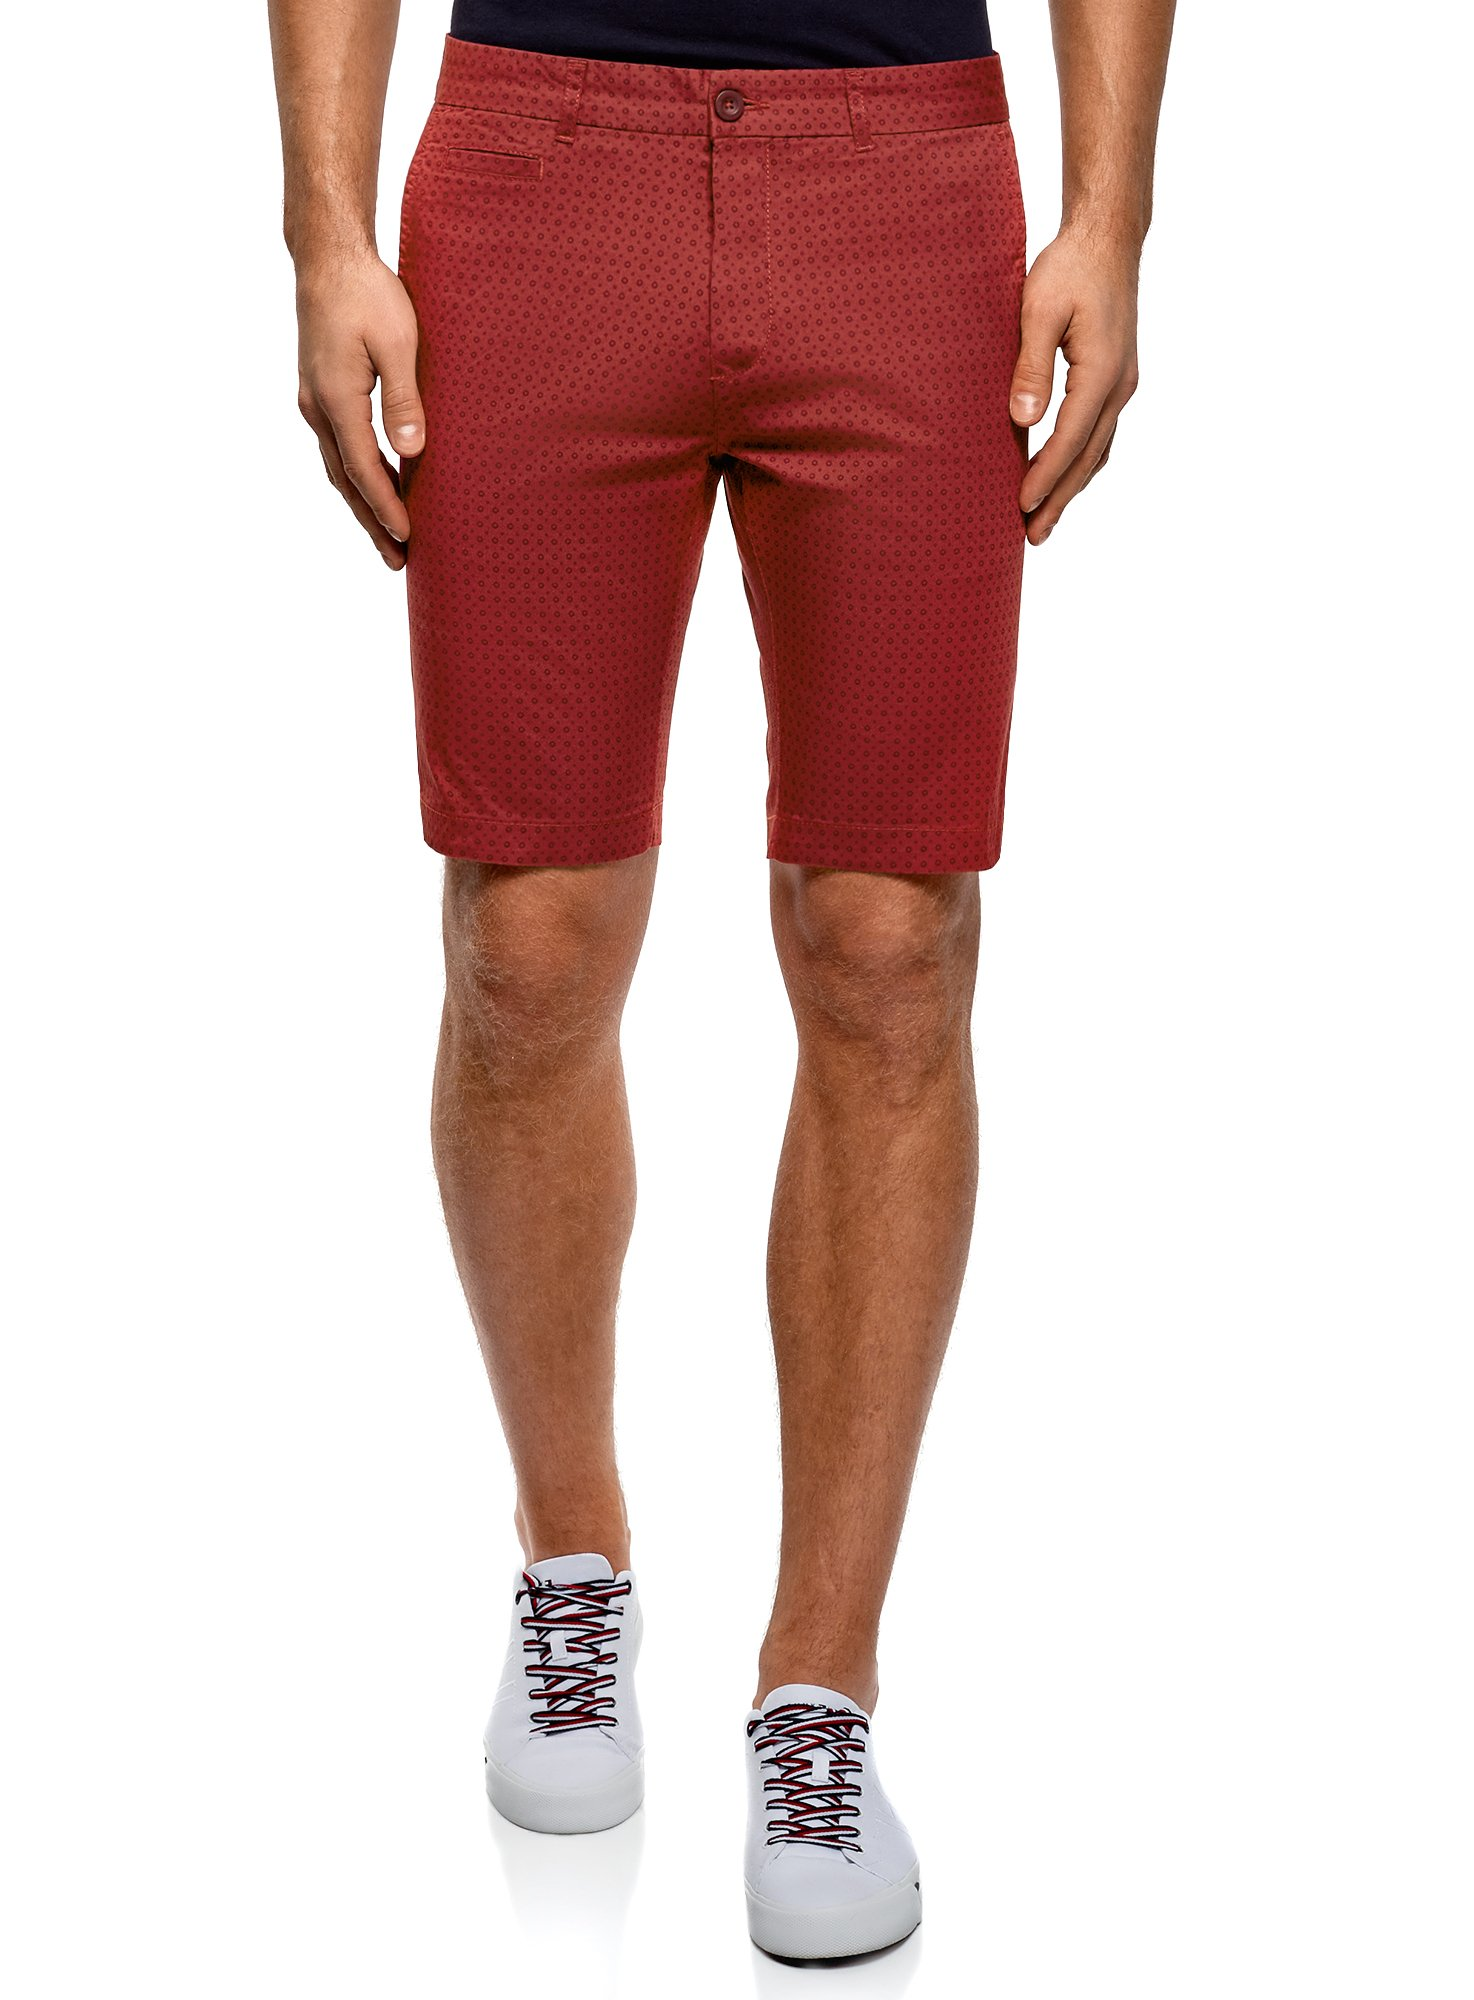 oodji Ultra Men's Printed Cotton Shorts, Red, US 32 / EU 42 / M